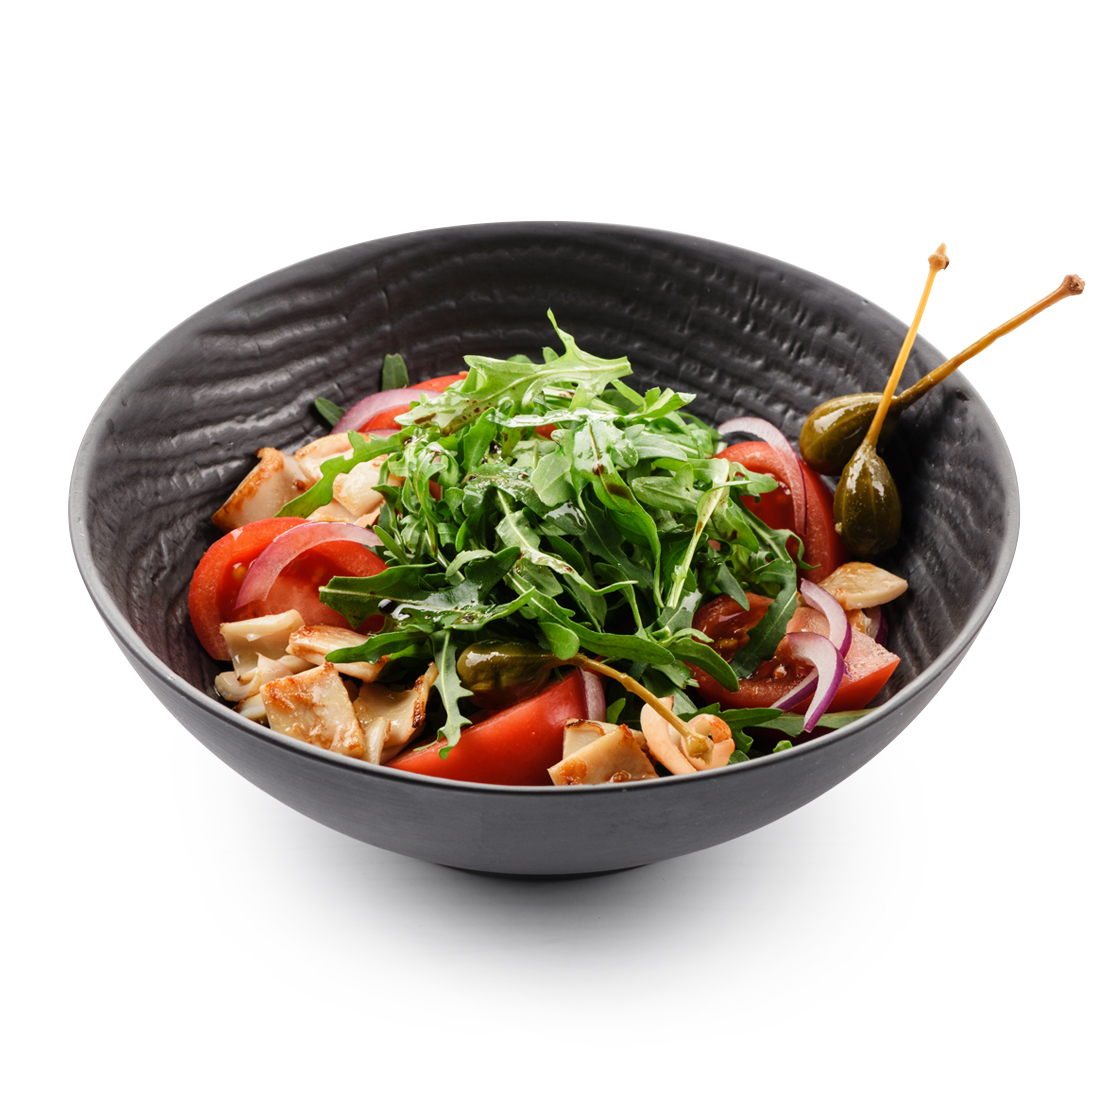 Теплый салат с командорским кальмаром